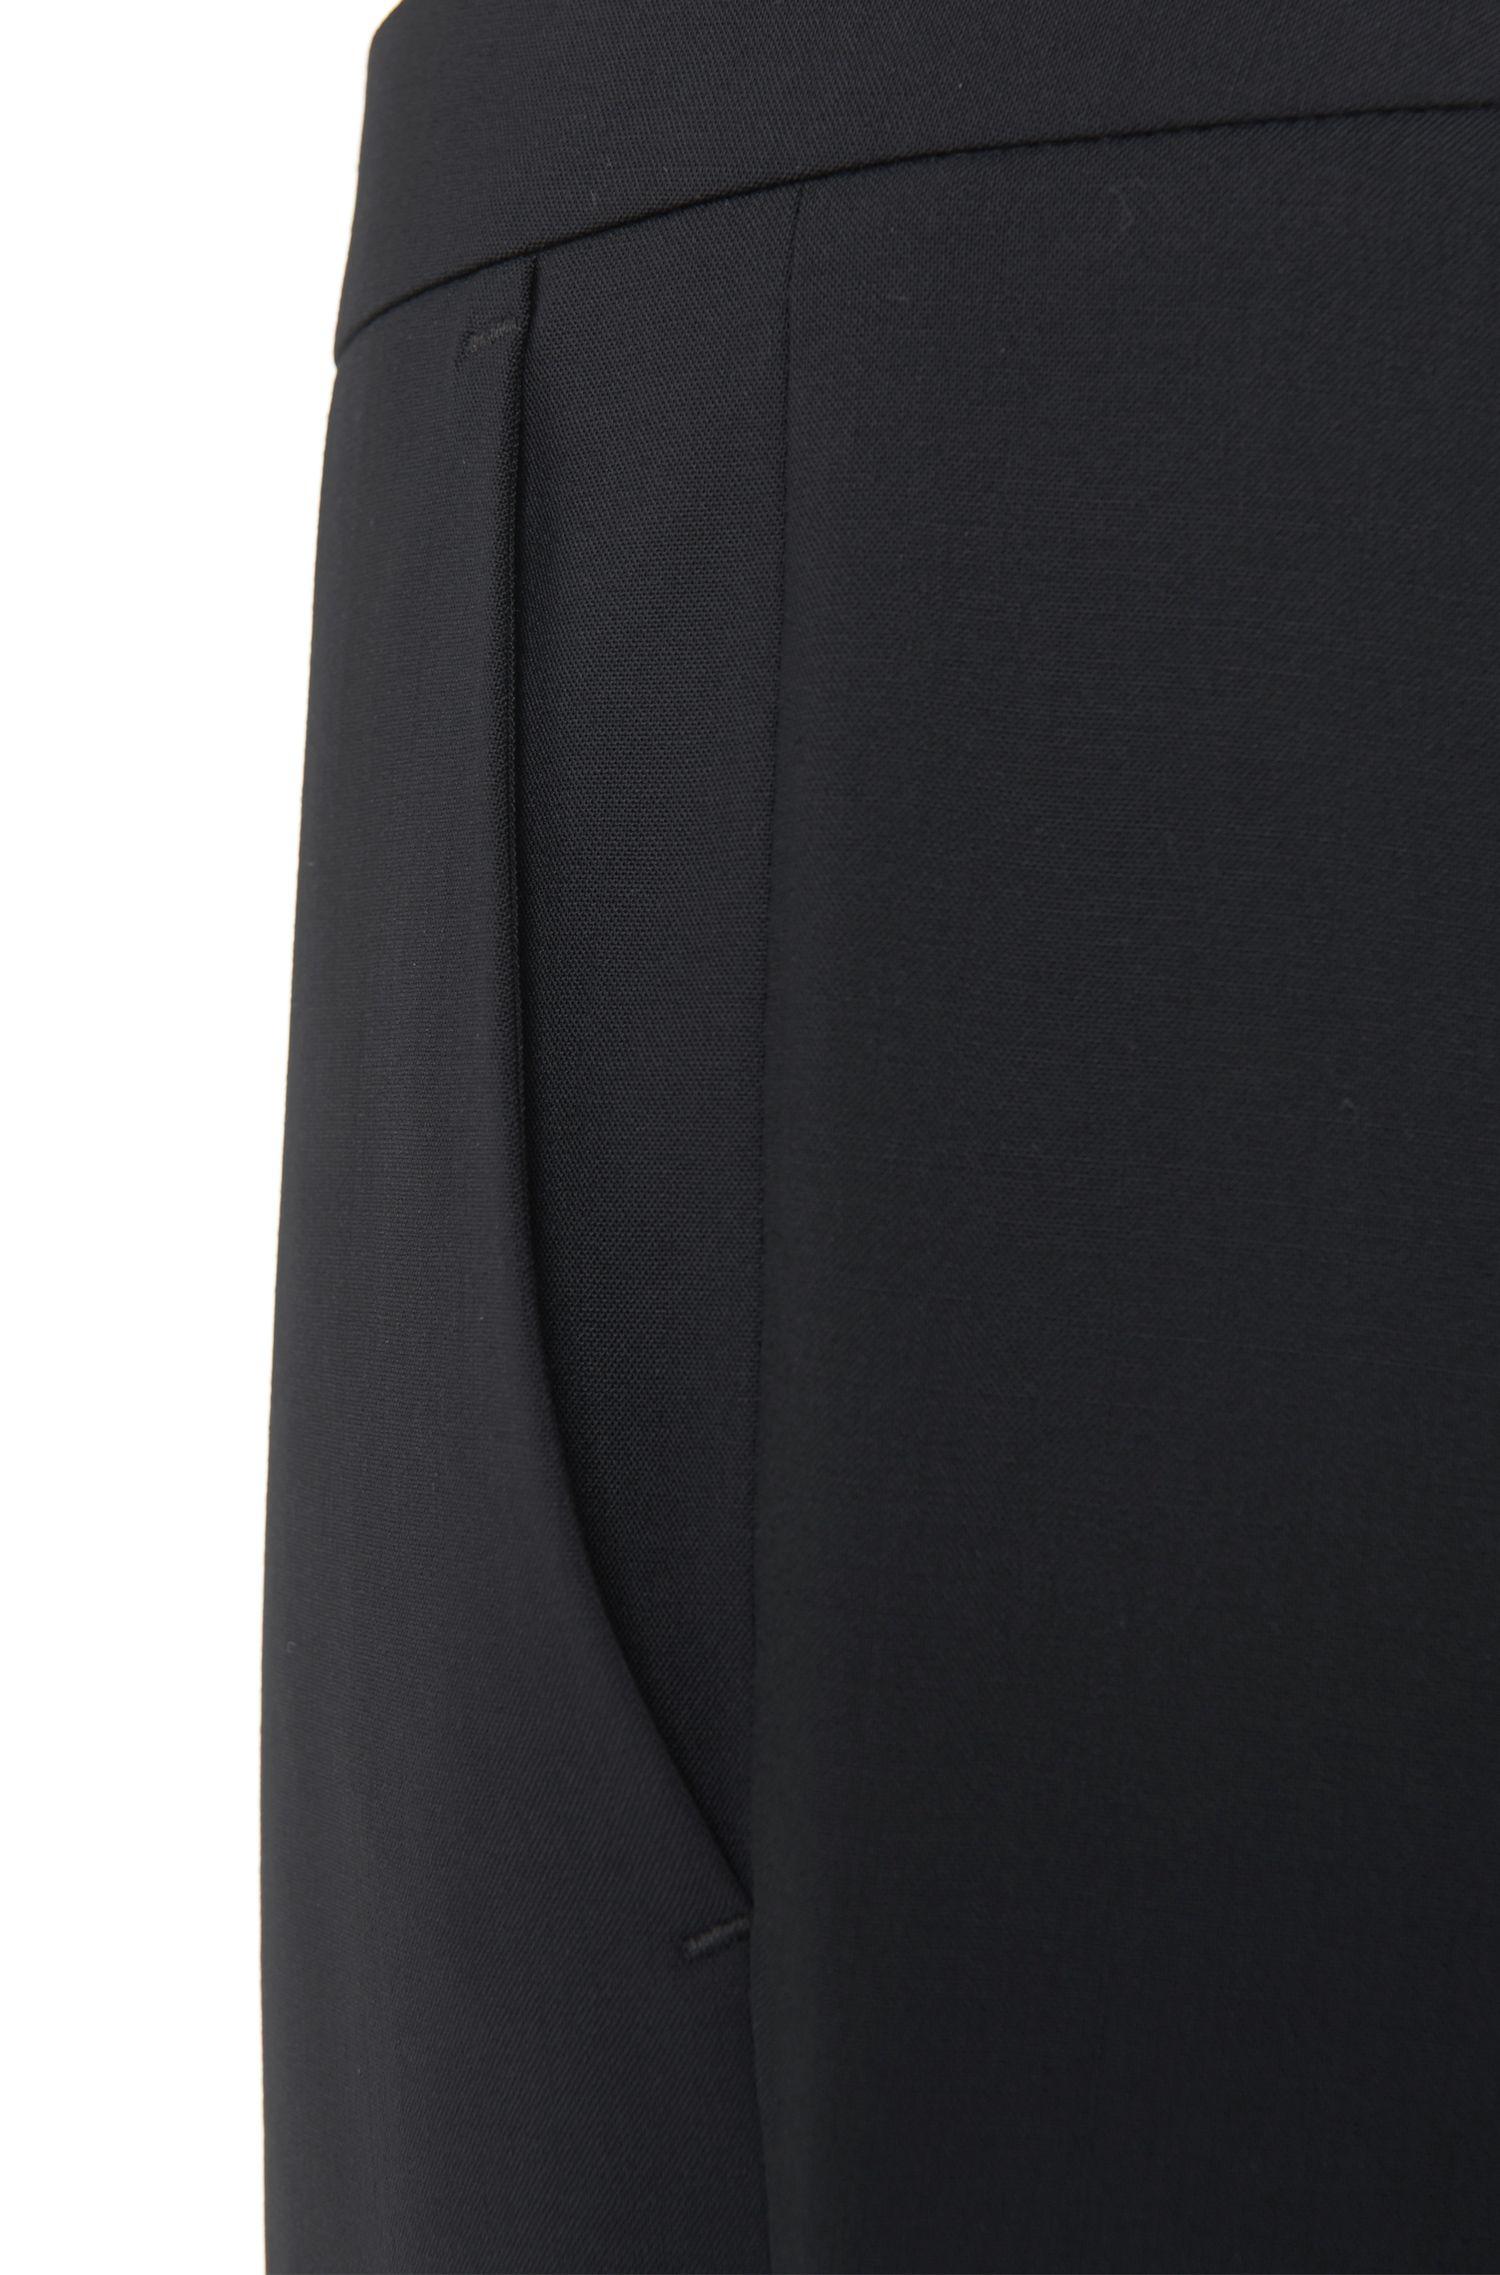 Stretch Virgin Wool Boot Cut Dress Pant   Tulea, Open Blue